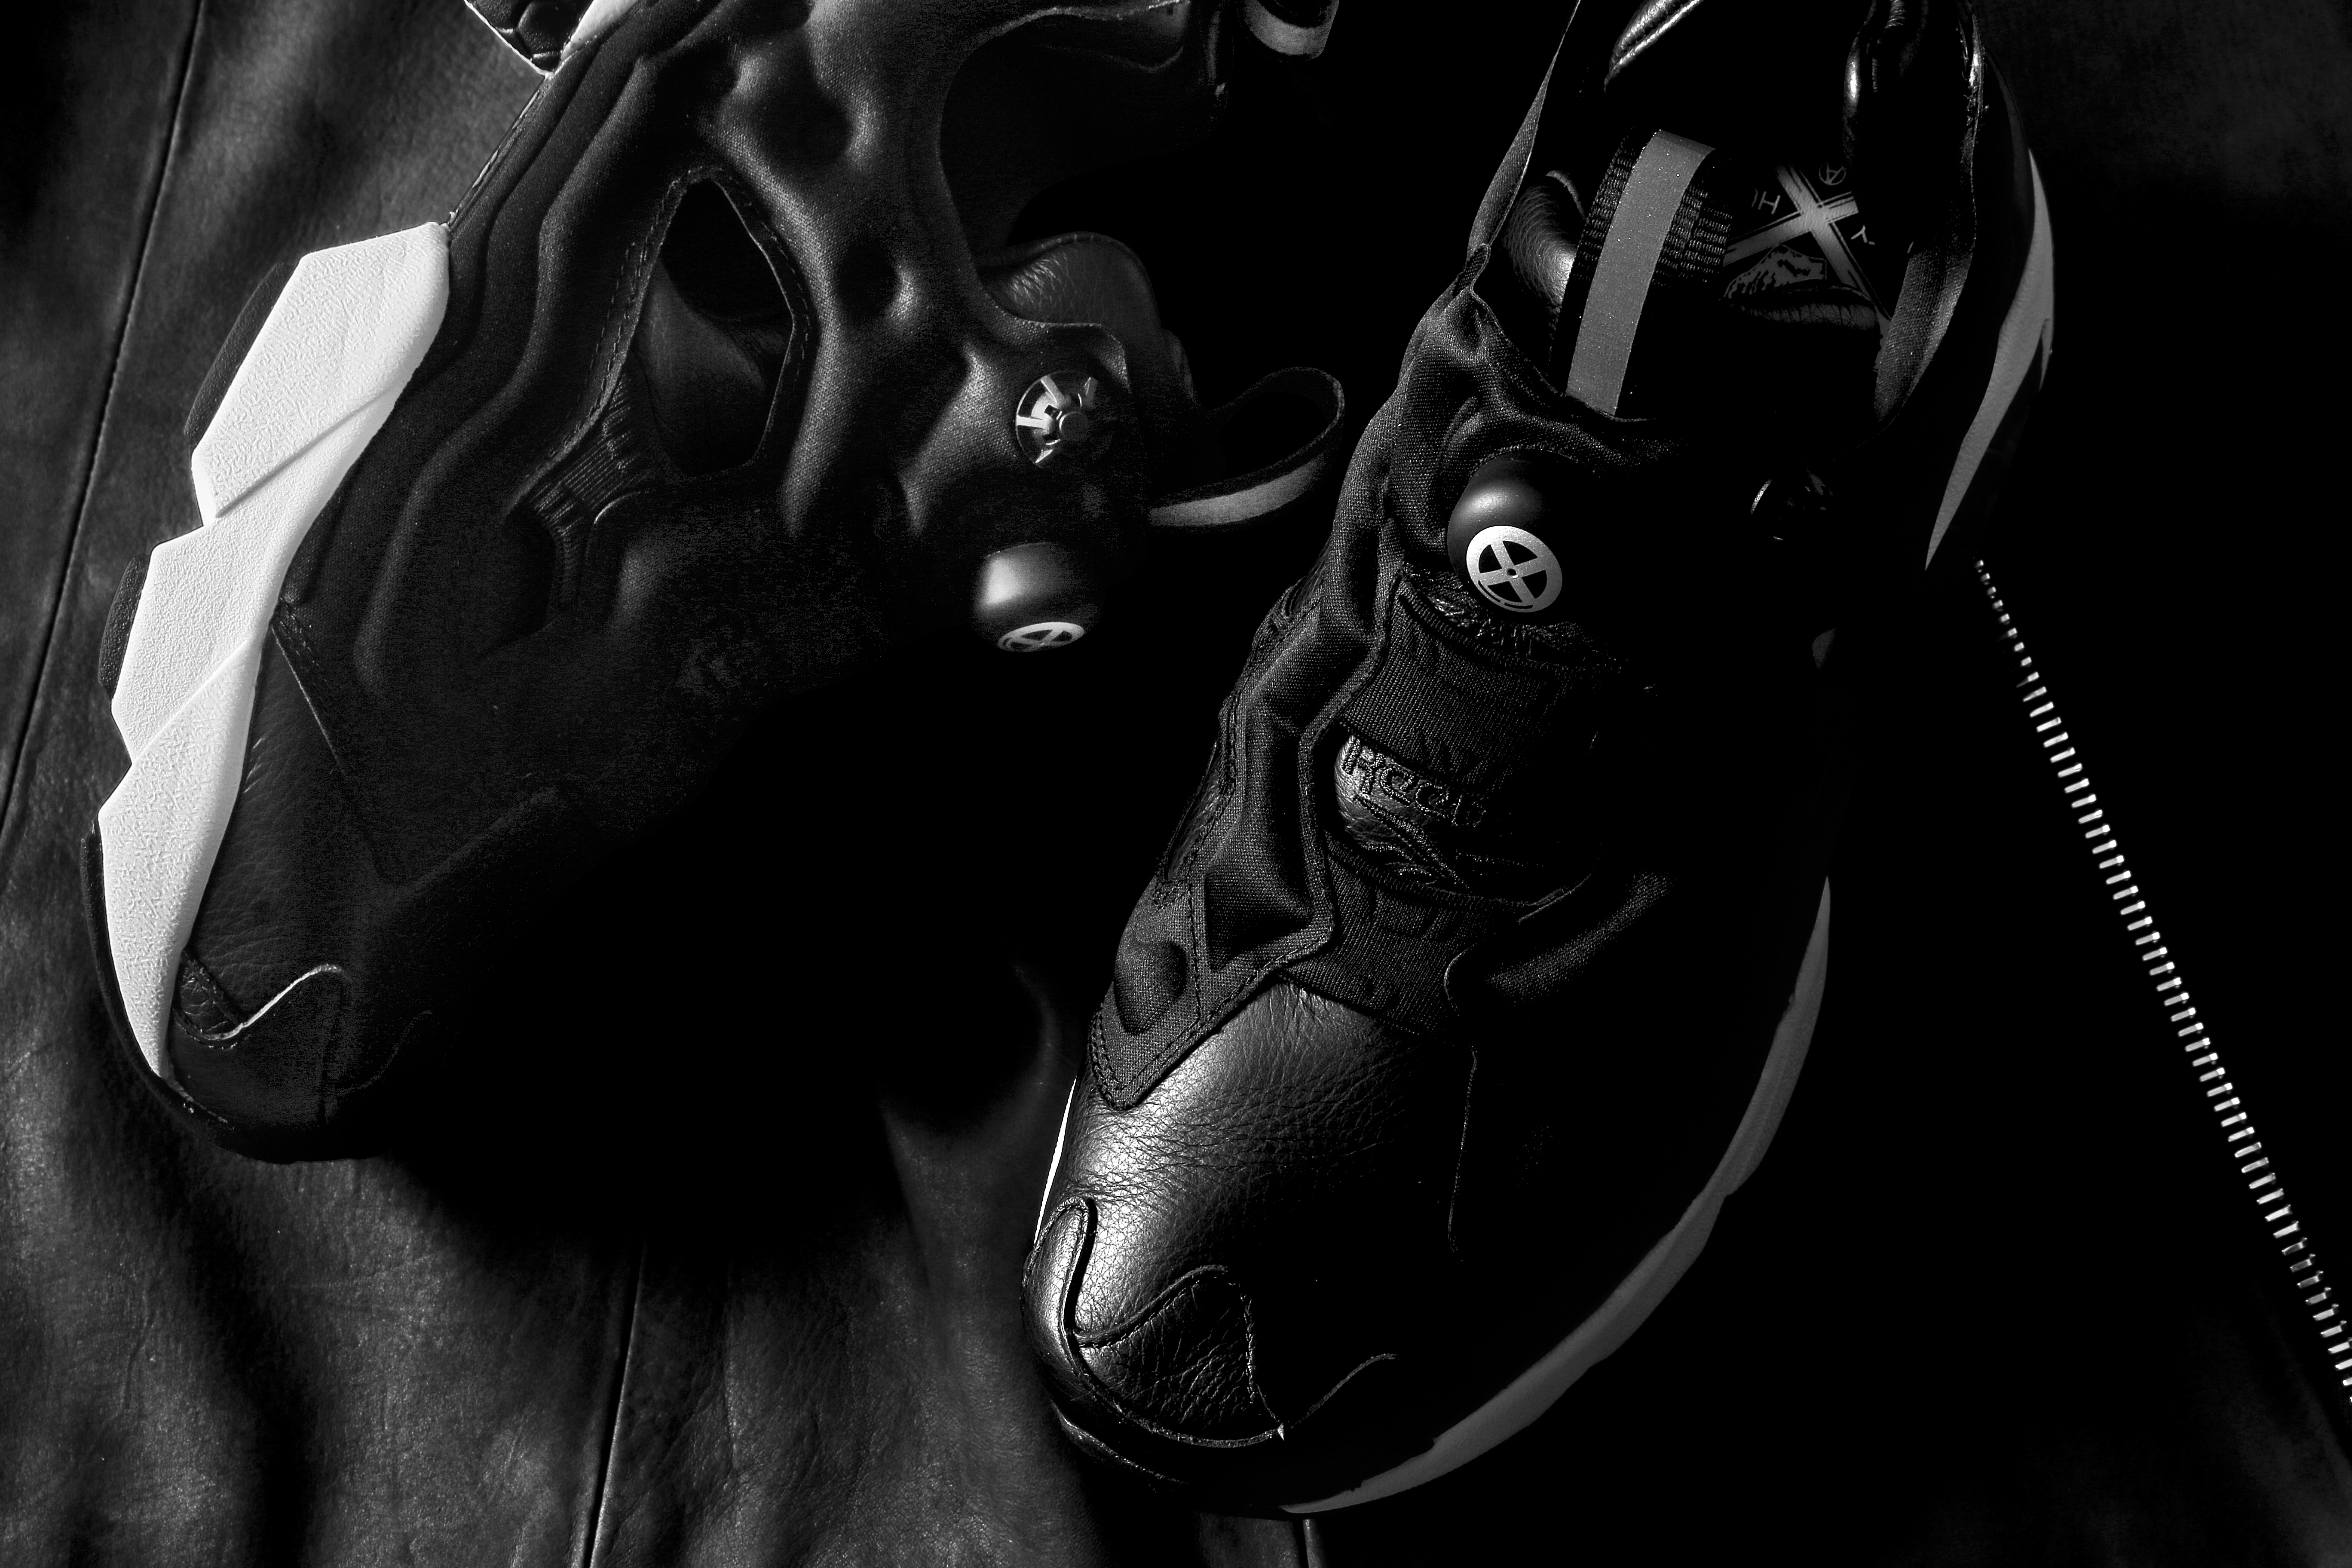 Instapump Fury Og Packer Shoes